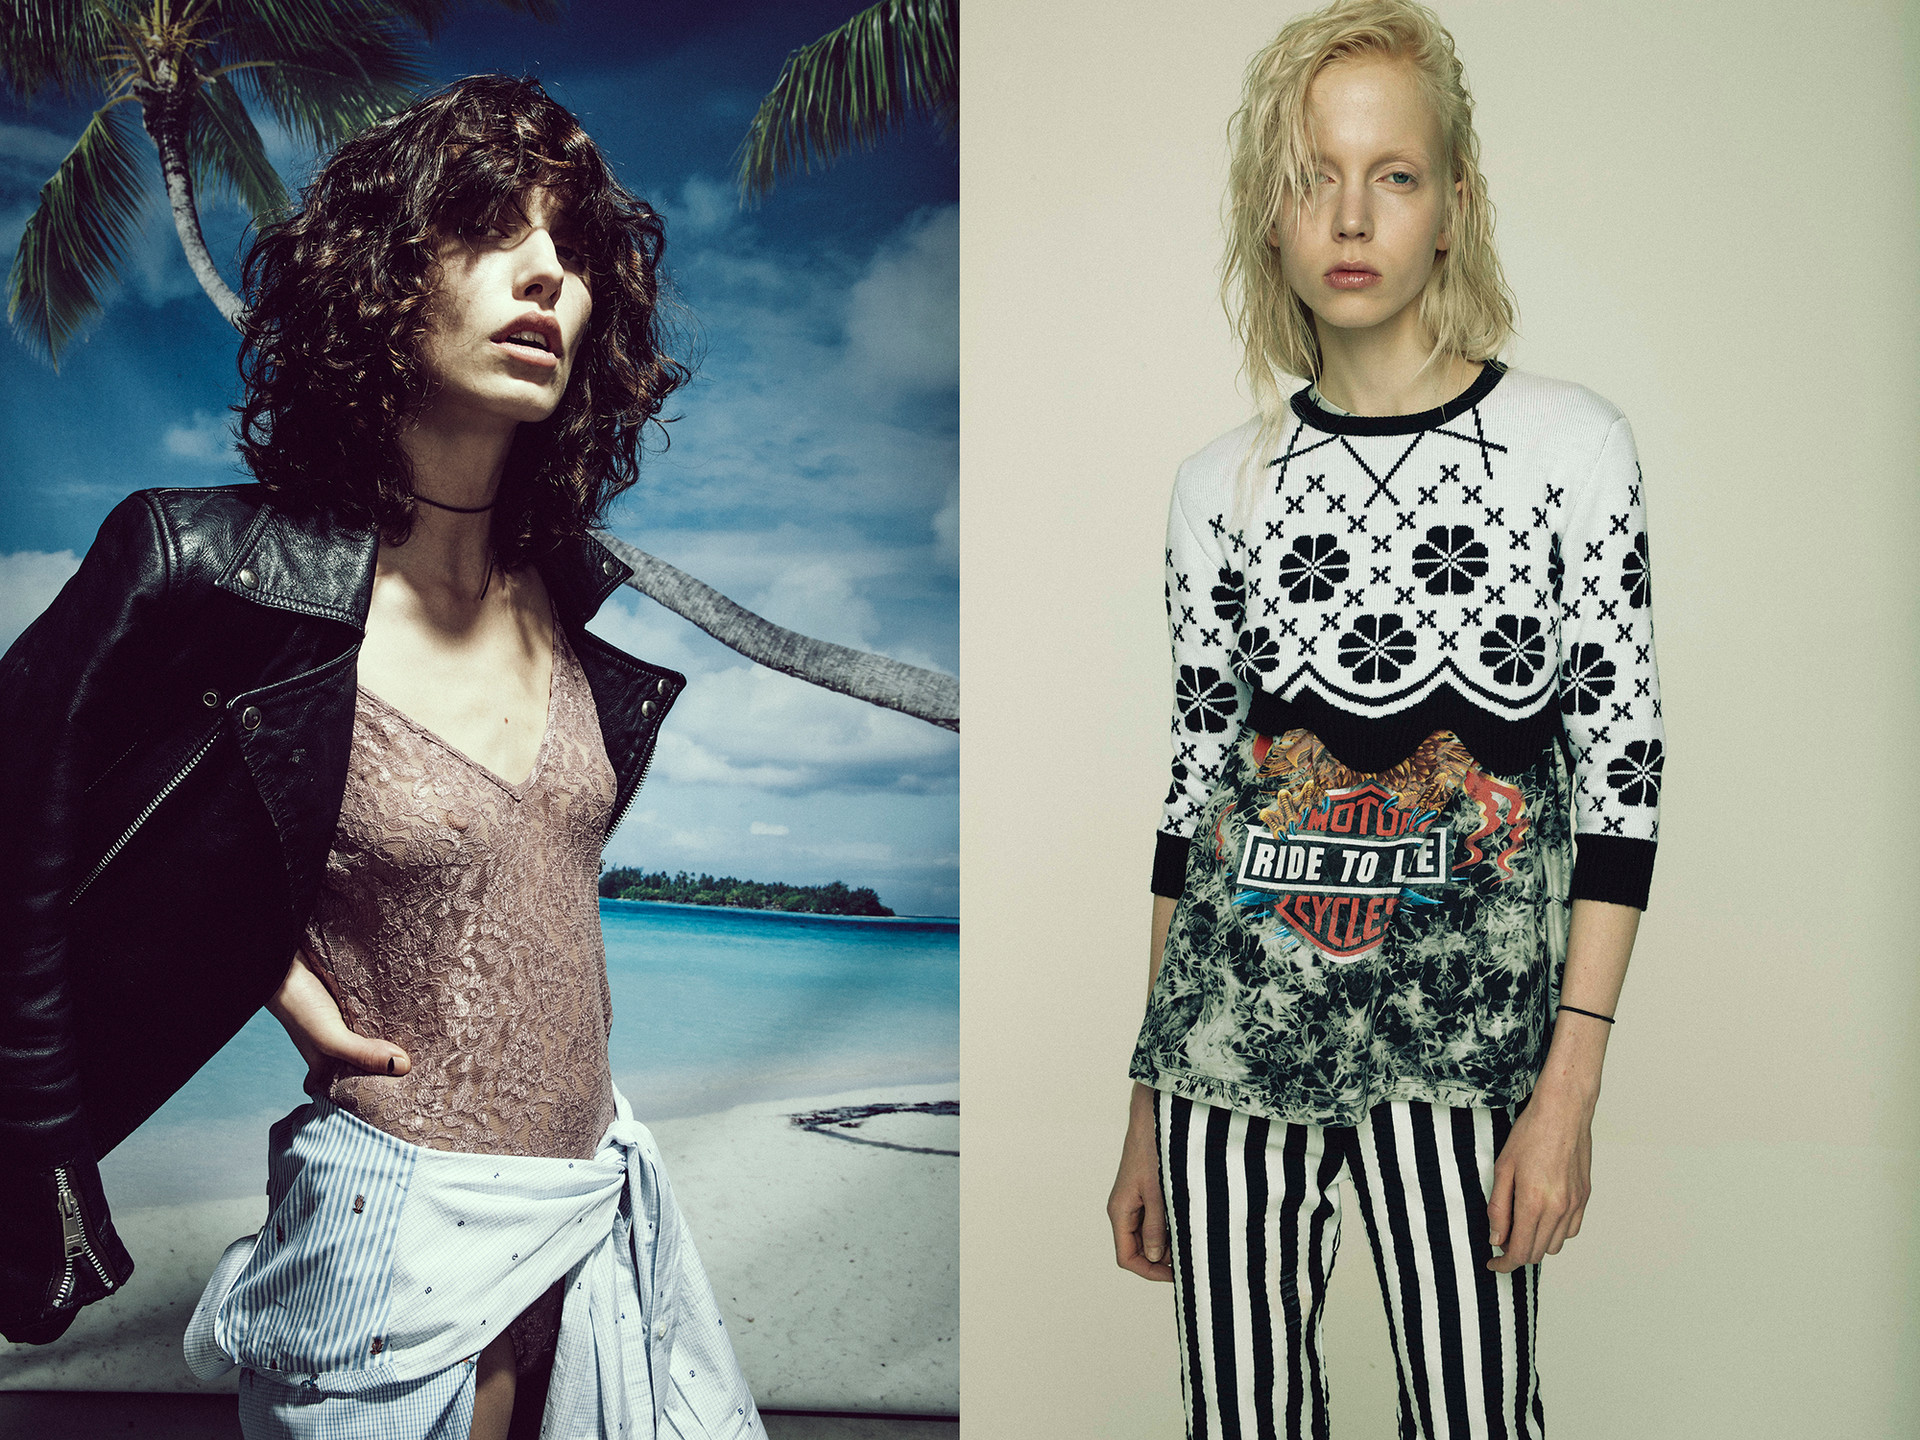 Vogue.it Young Models